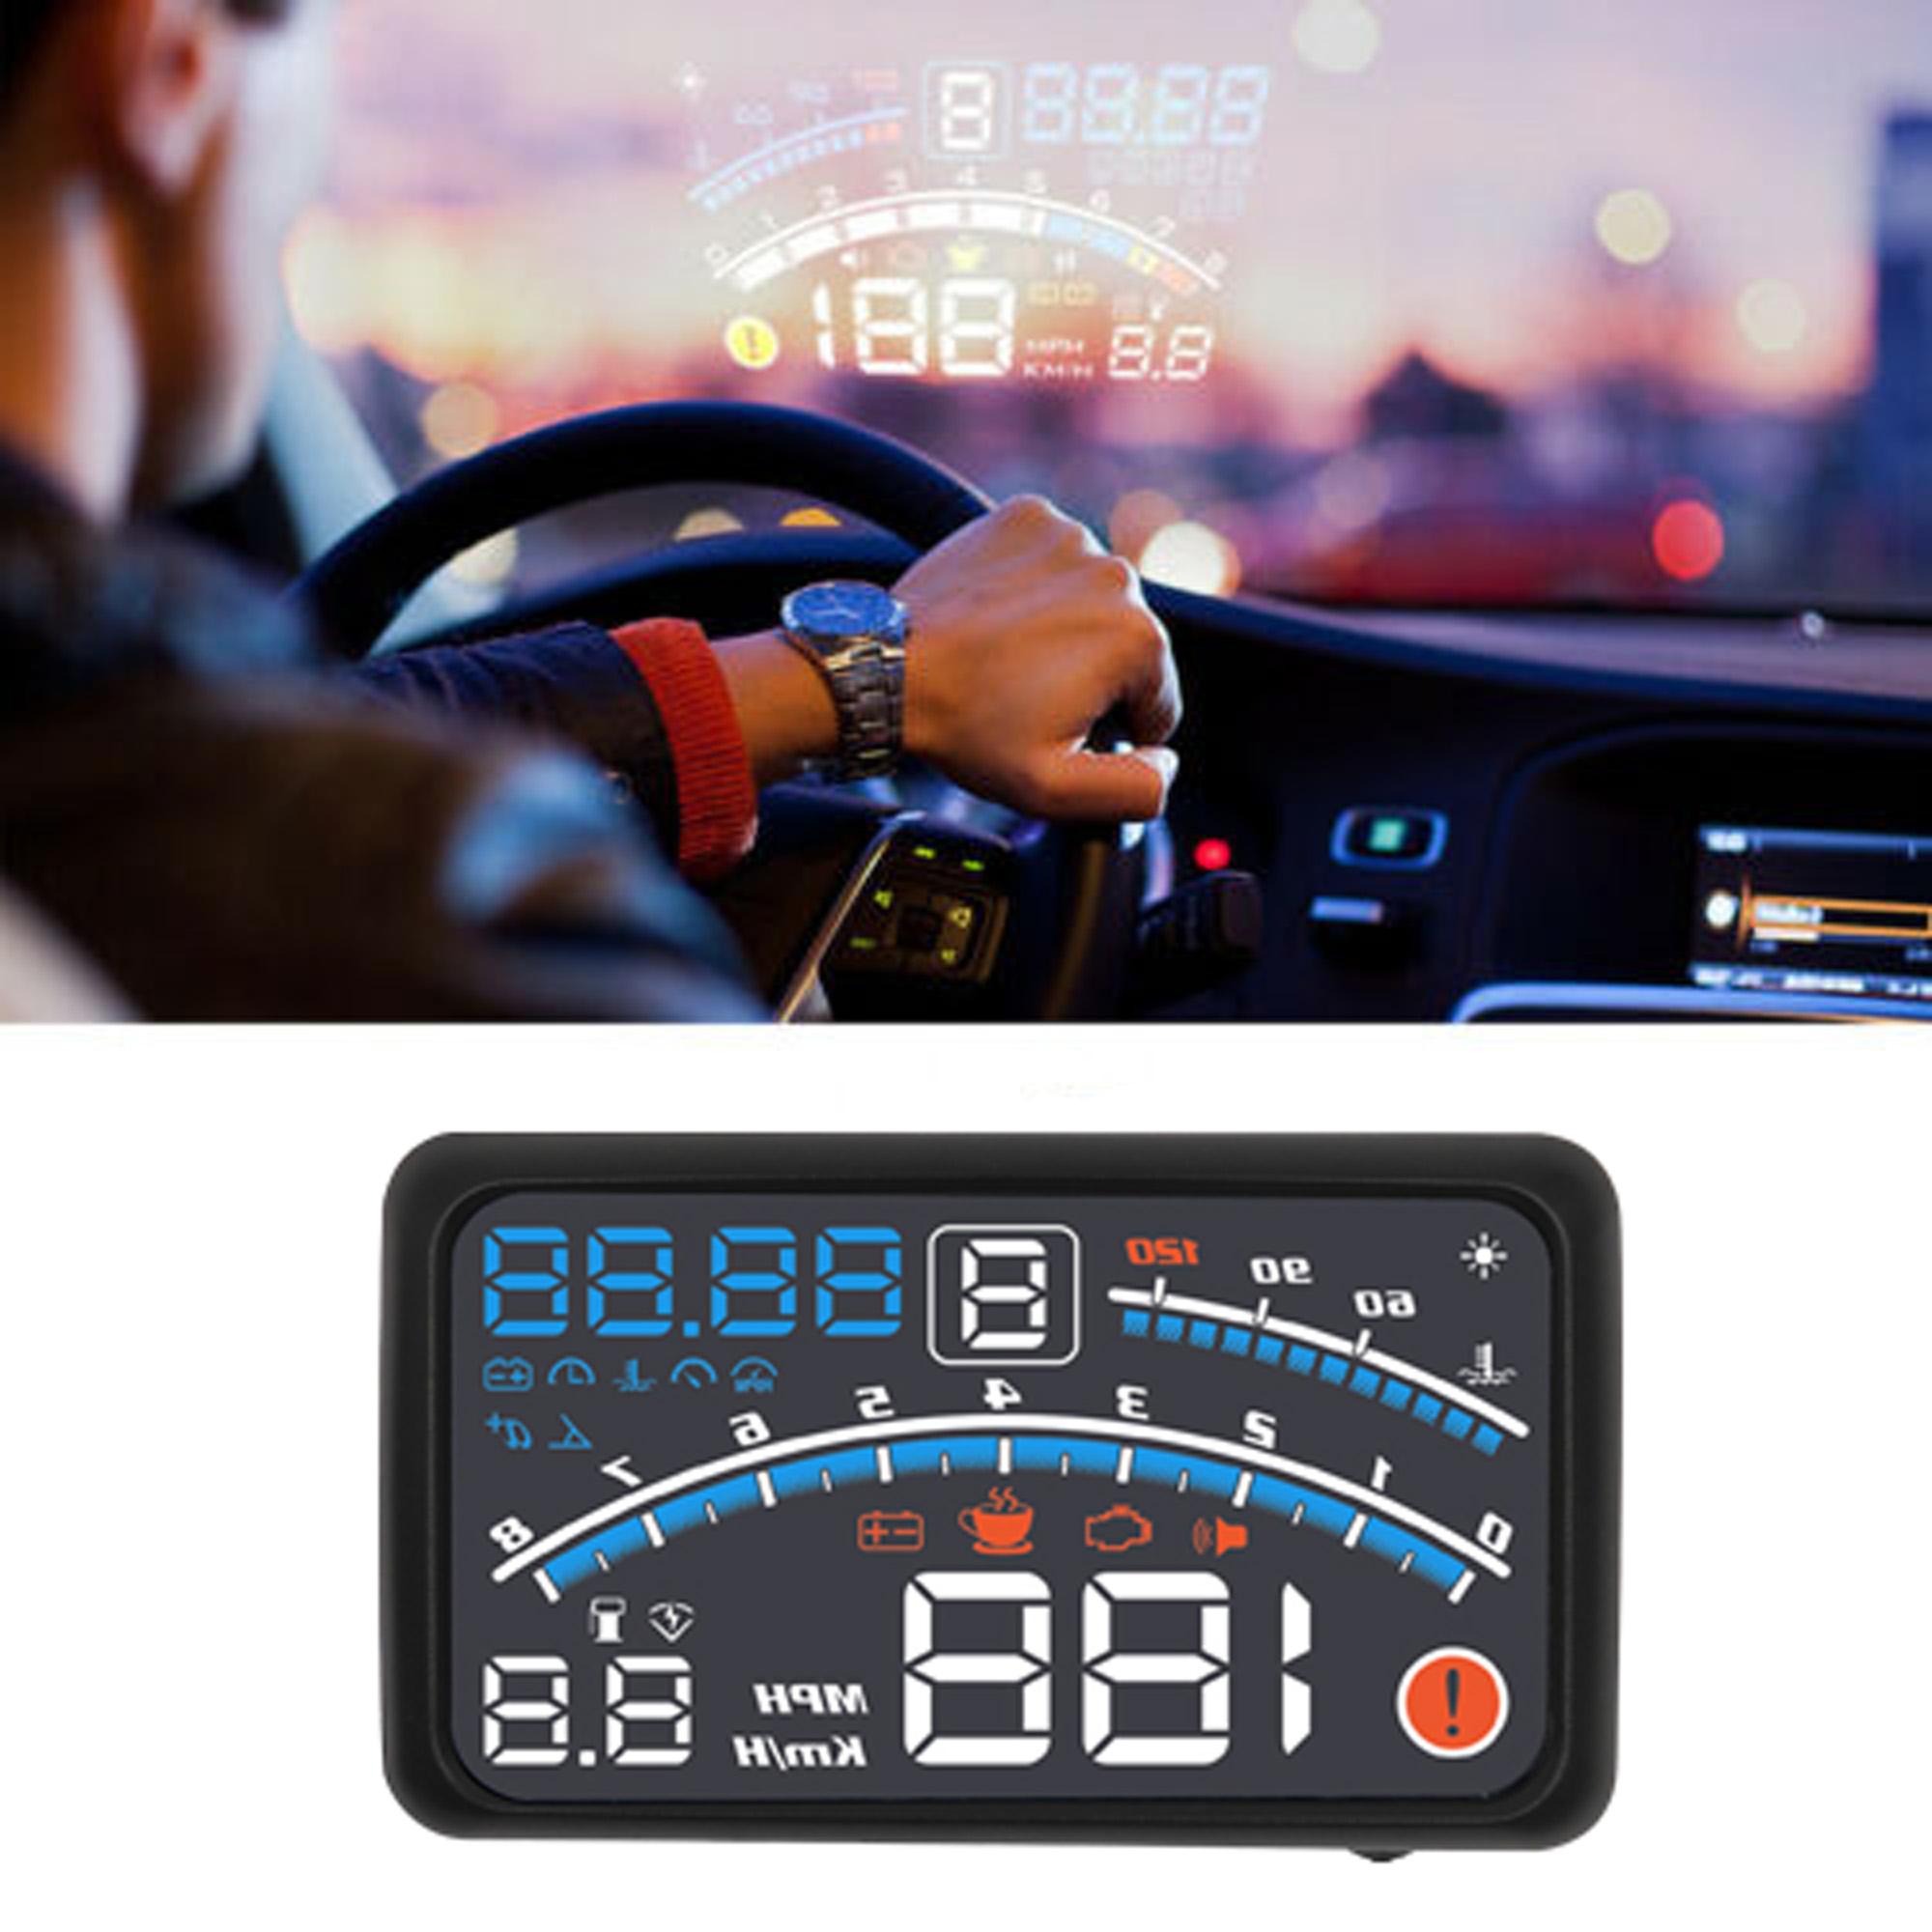 5 5 Car Vehicle Obd2 Hud Head Up Display Fuel Consumption Overspeed Warning